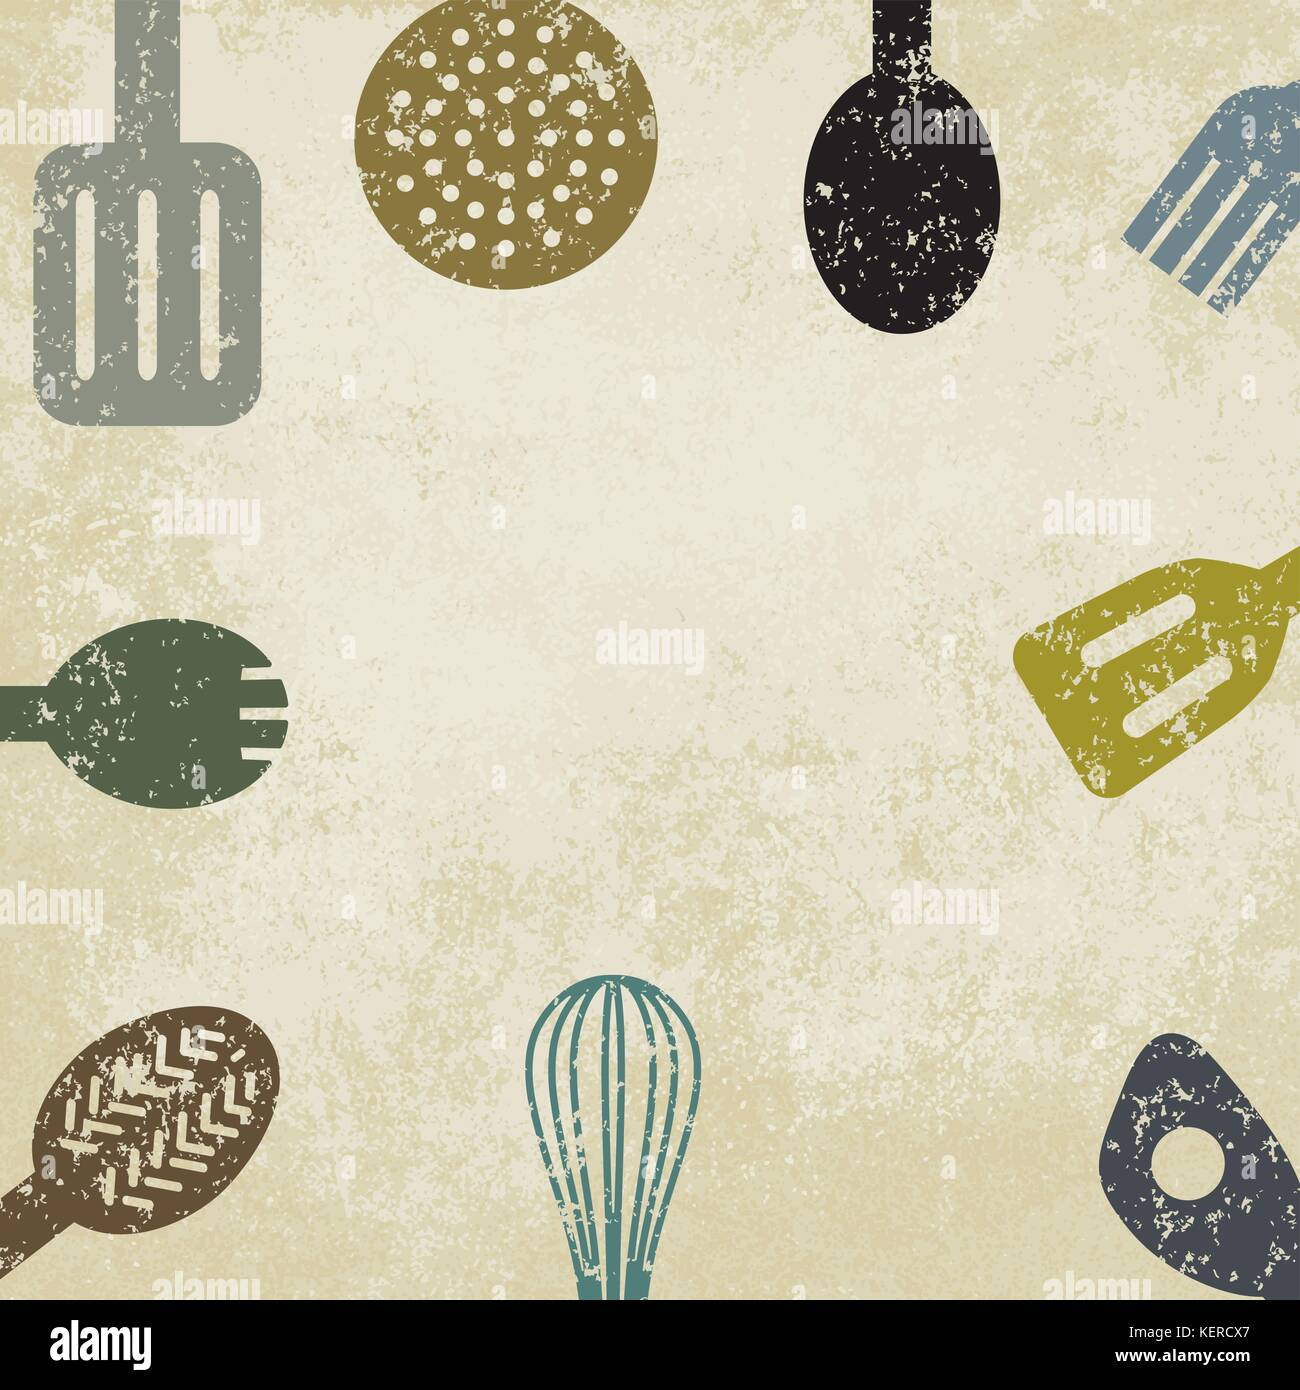 Kitchen utensils on old paper background. - Stock Vector